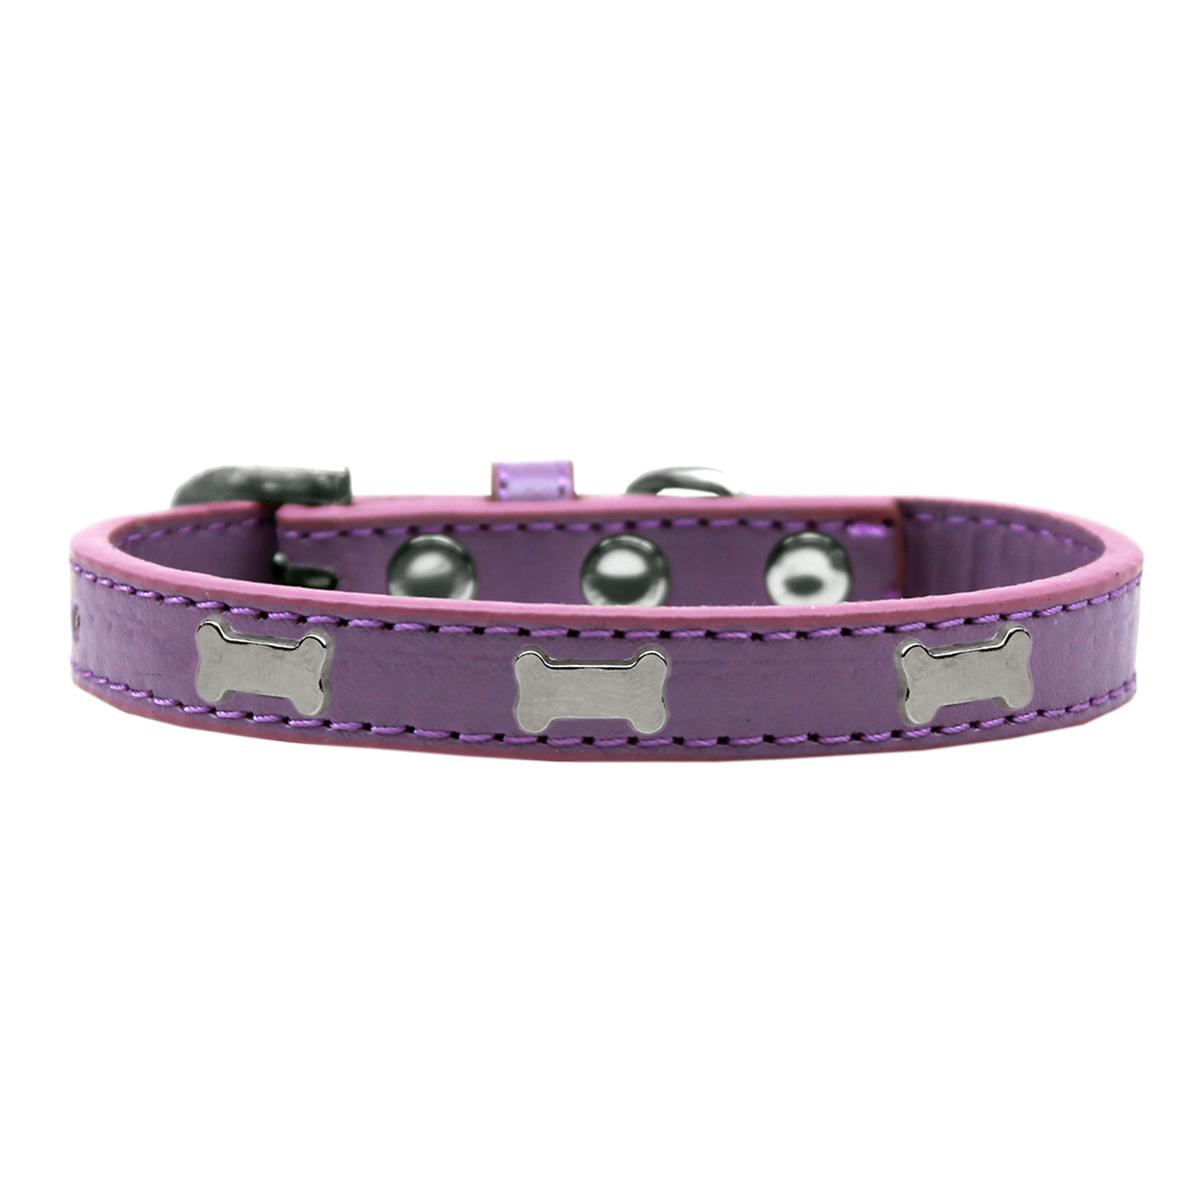 Silver Bone Widget Dog Collar - Lavender